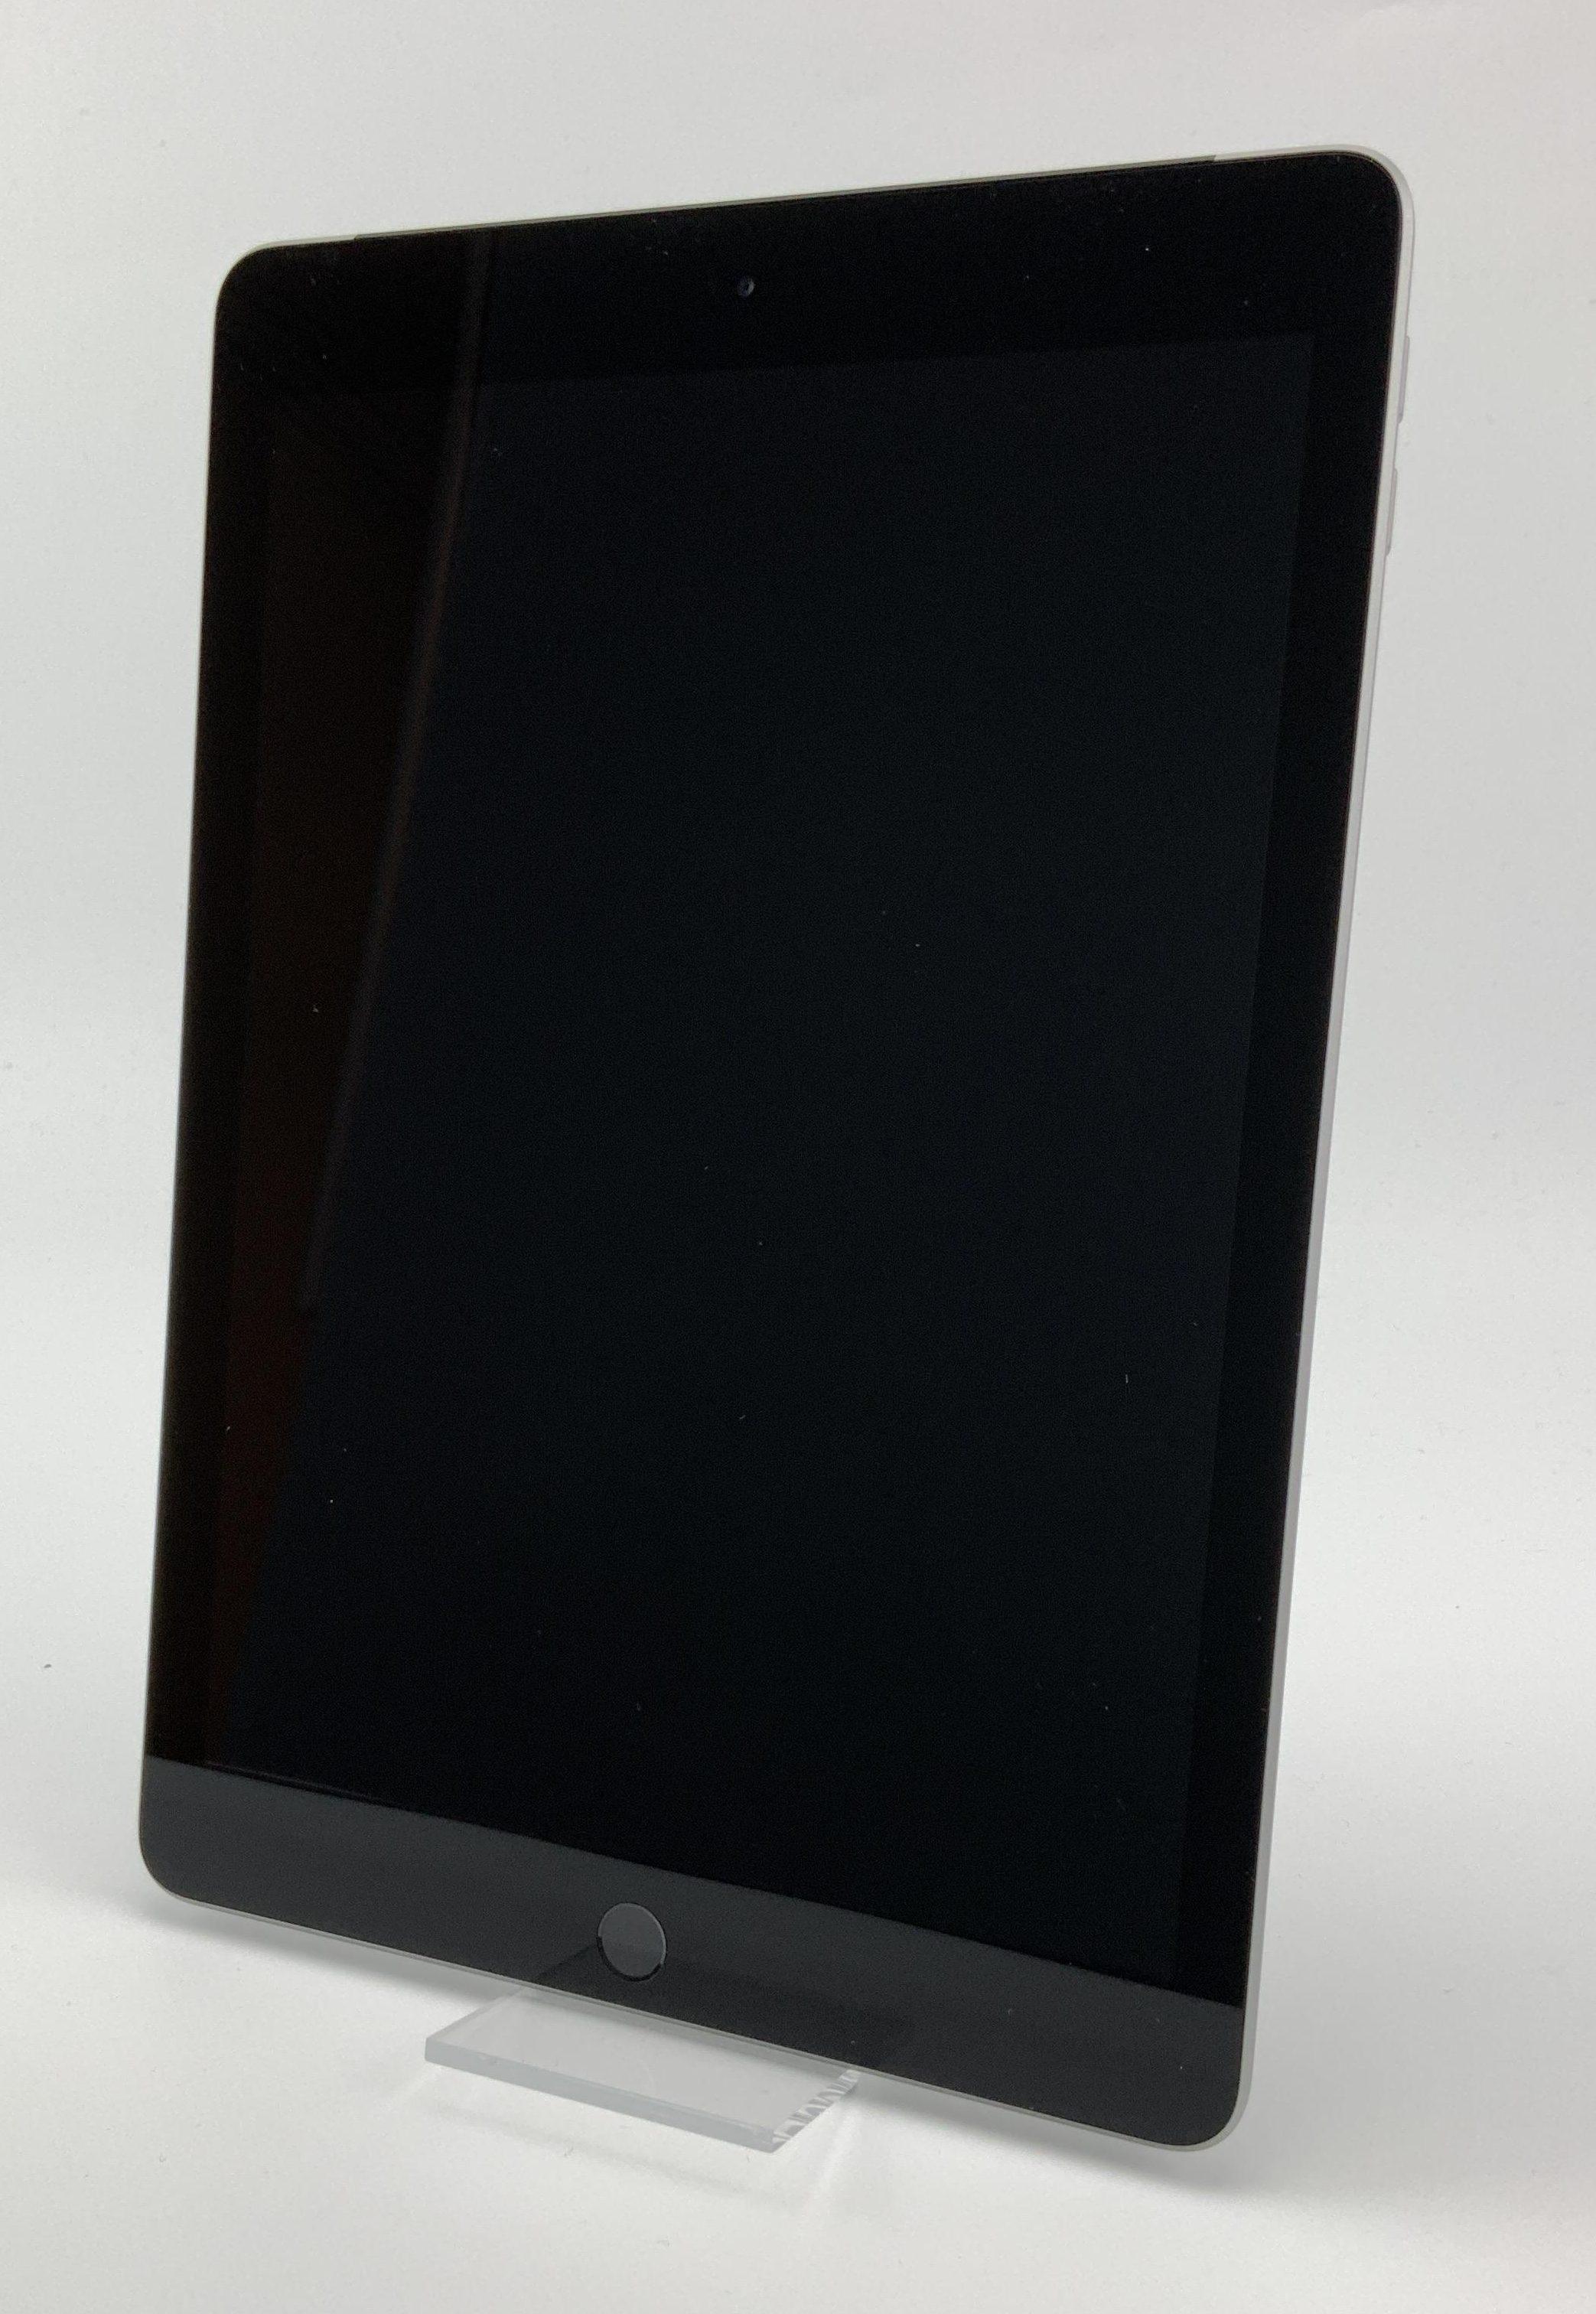 iPad 6 Wi-Fi + Cellular 128GB, 128GB, Space Gray, imagen 1